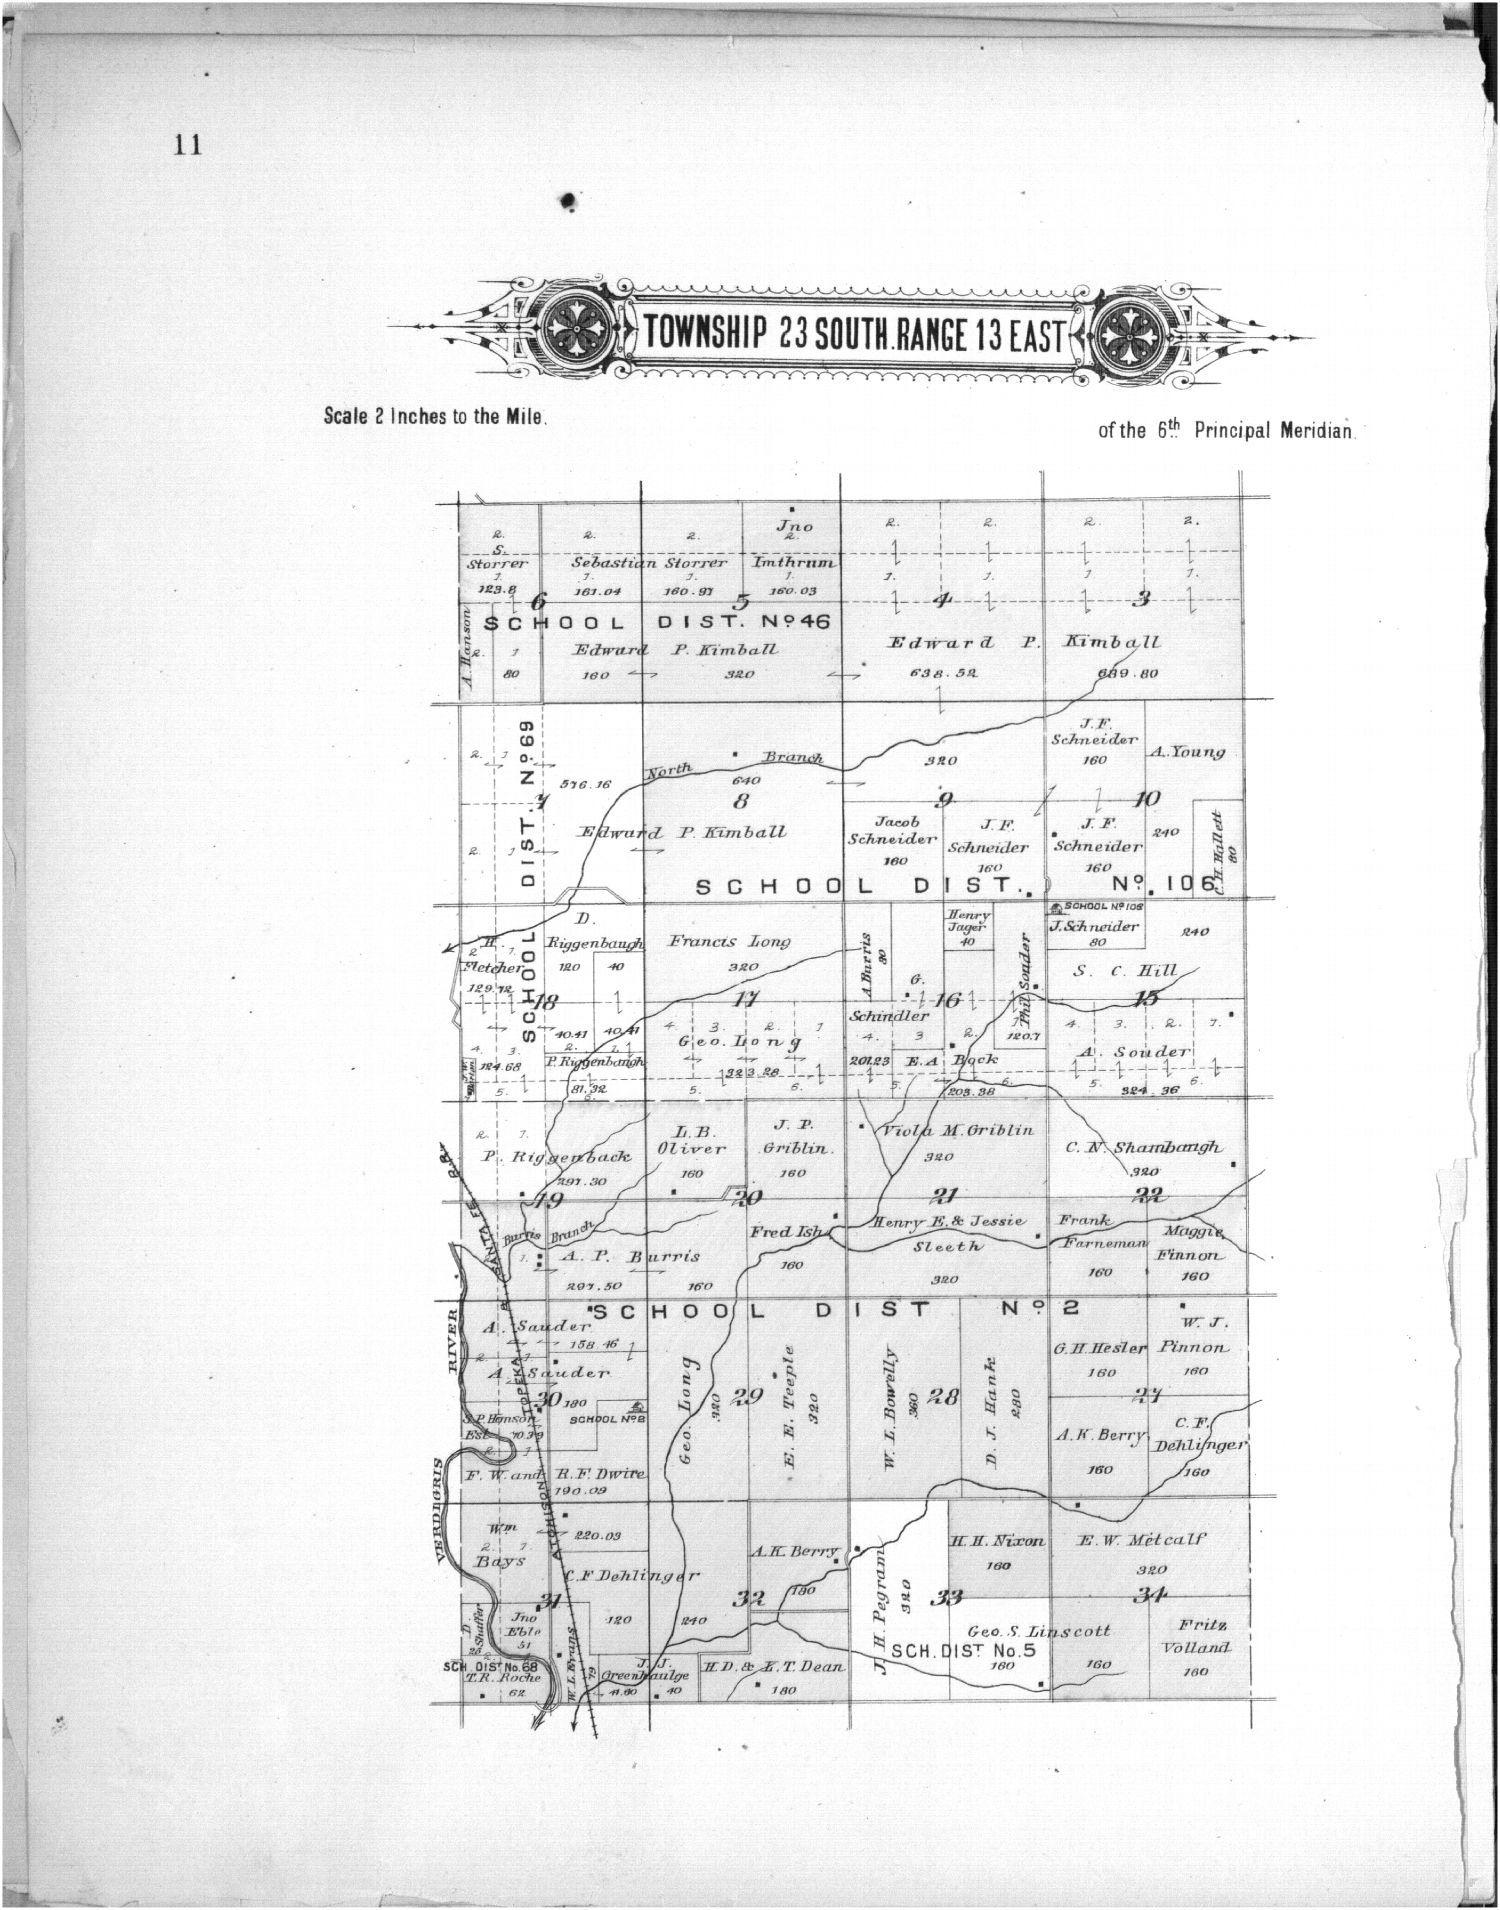 Plat book of Greenwood County, Kansas - 11